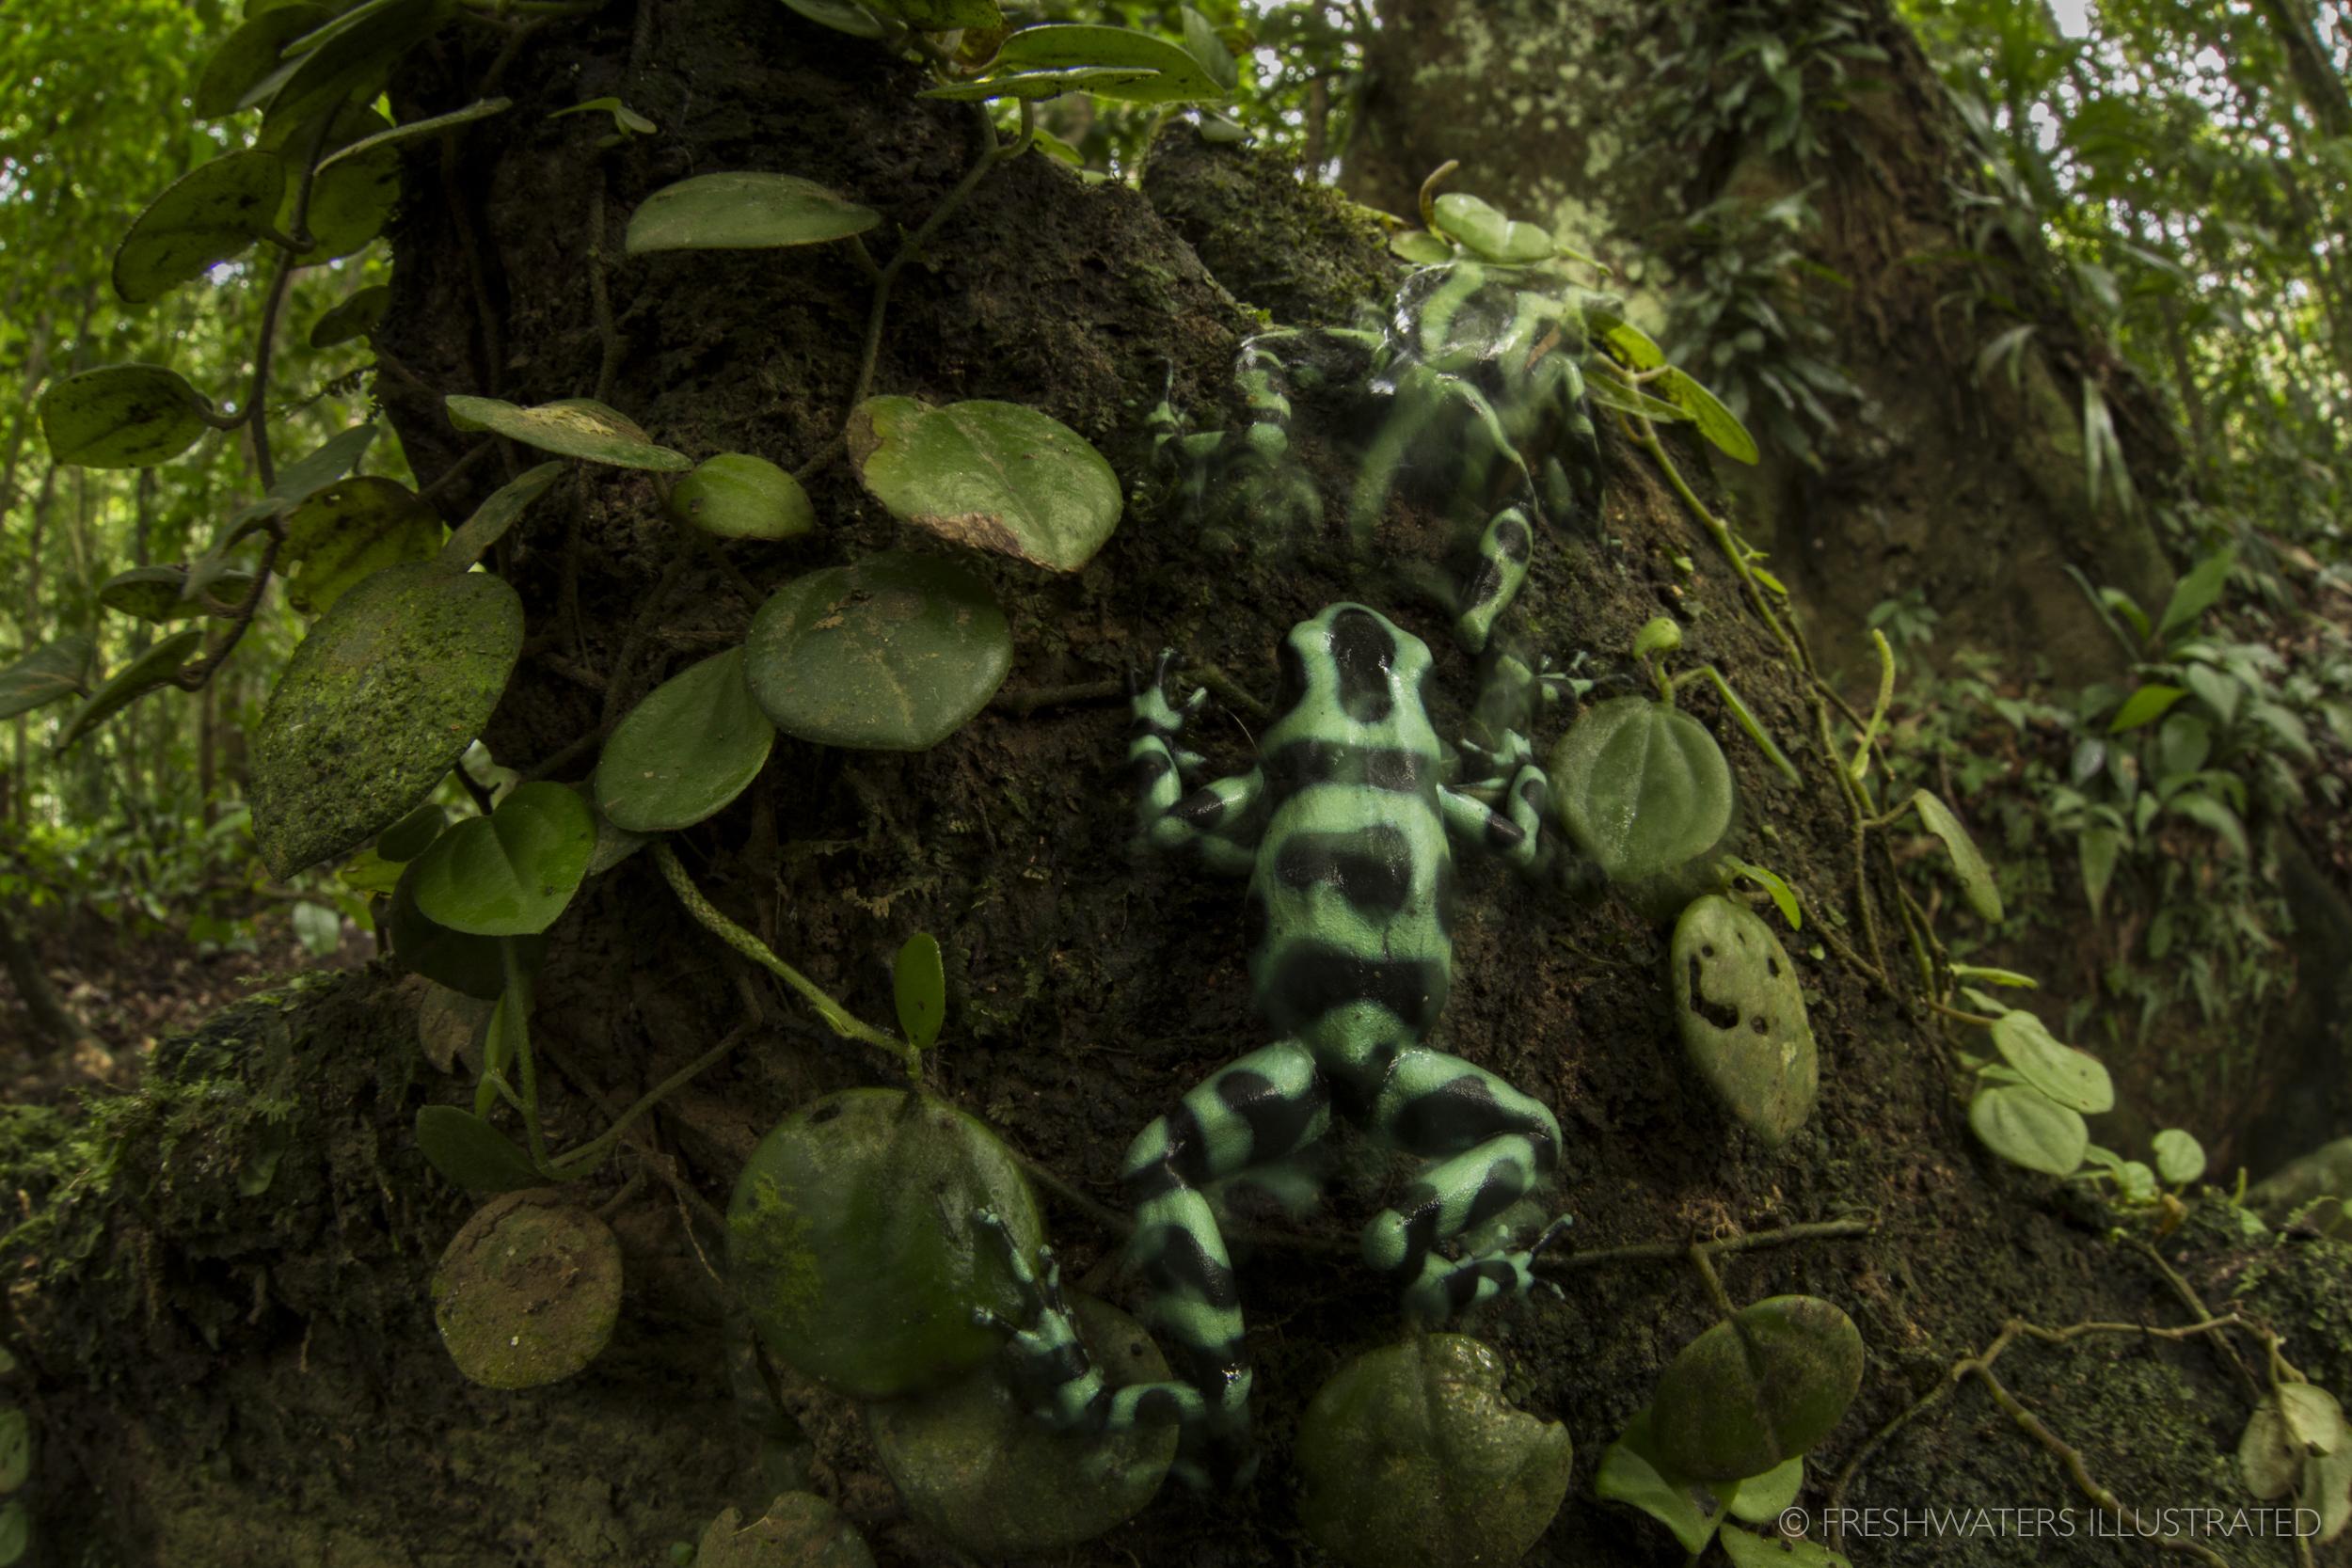 Territorial dispute between two green and black poison dart frogs (Dendrobates auratus) Talamanca, Costa Rica